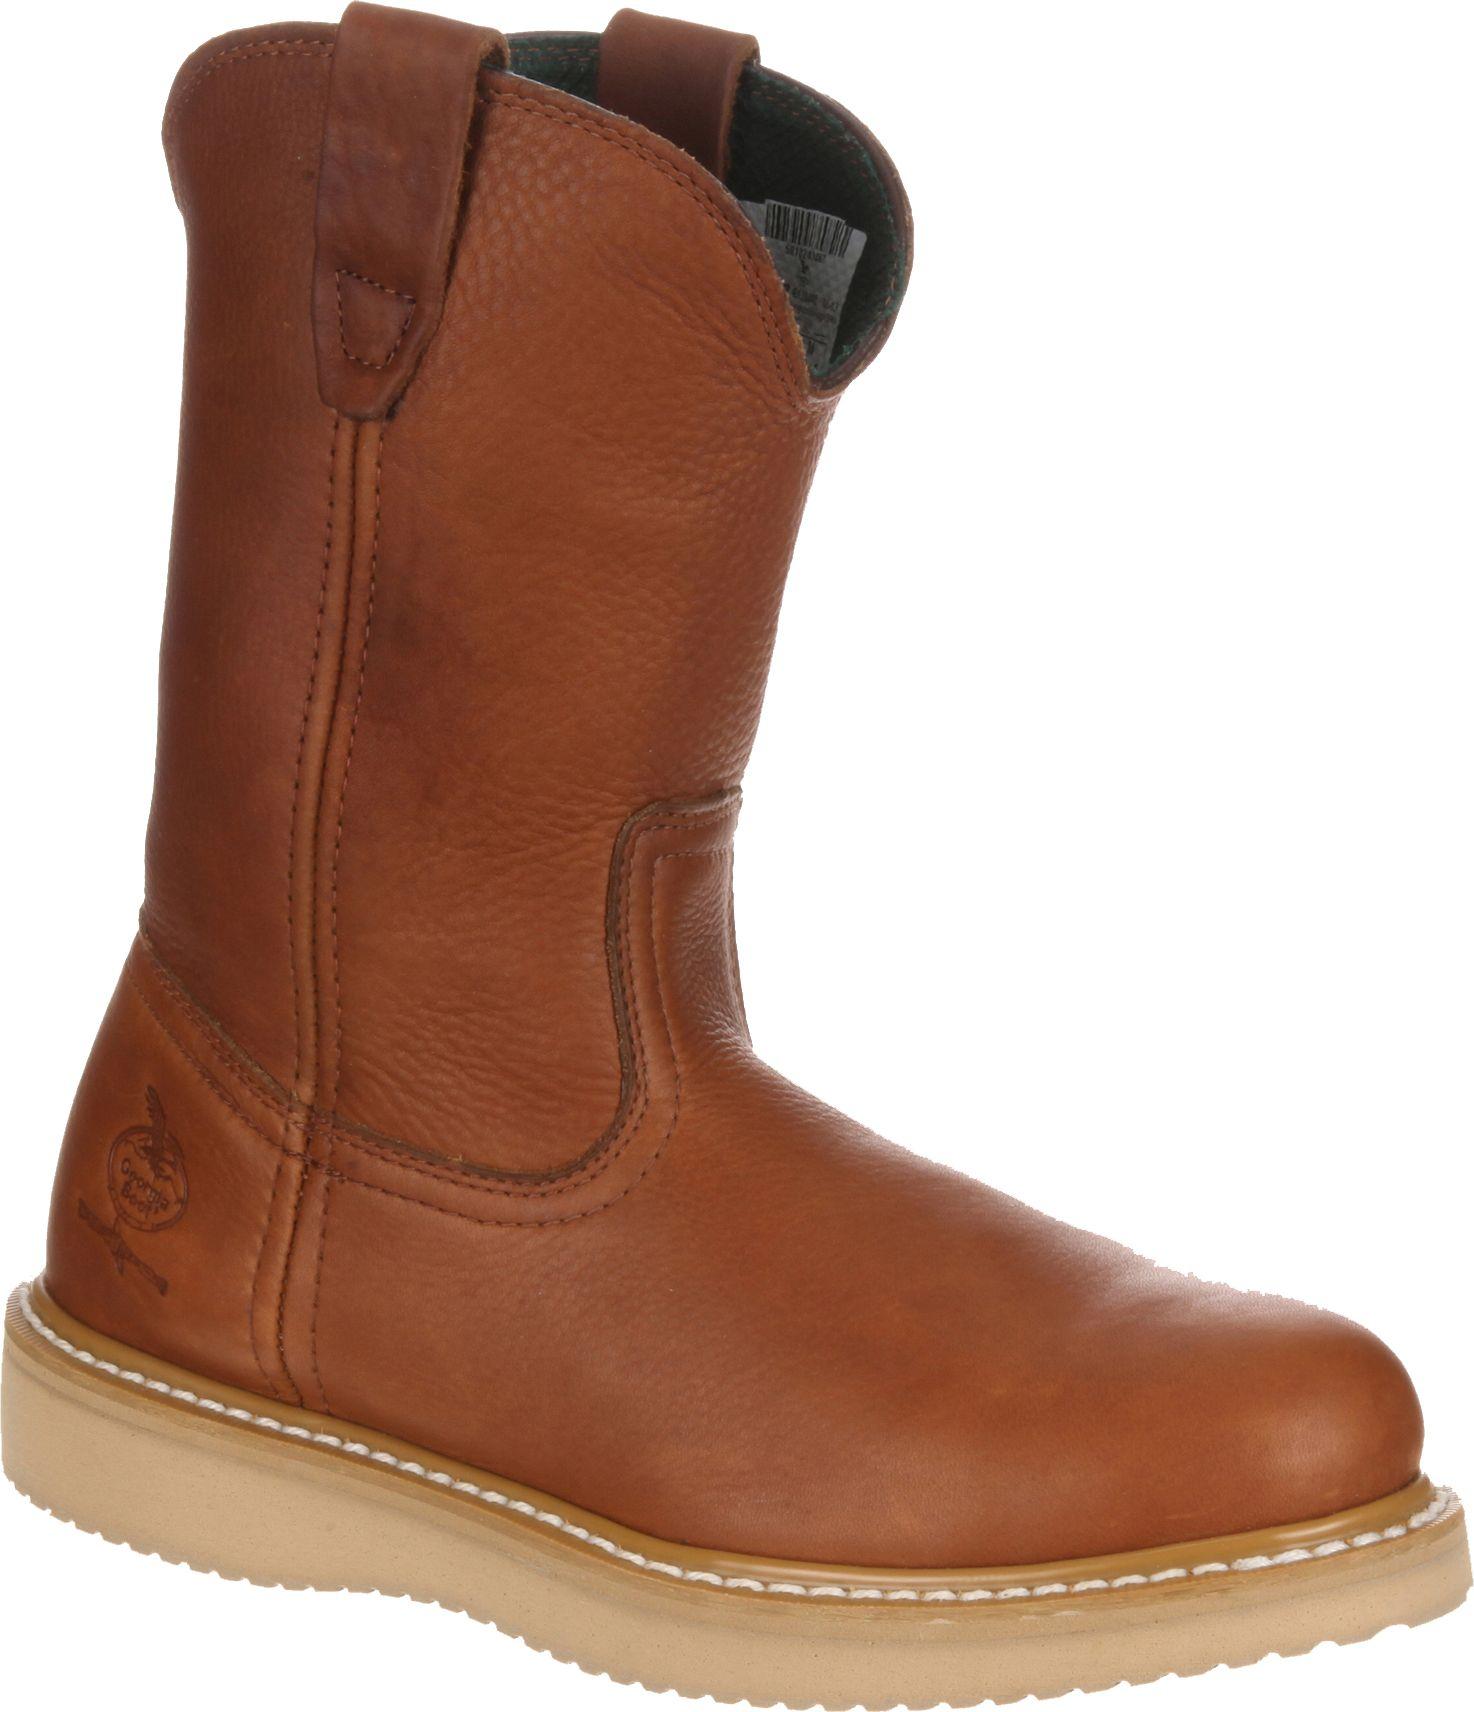 Men's Georgia Boot Farm & Ranch Wellington Work Boots (Barracuda Gold)